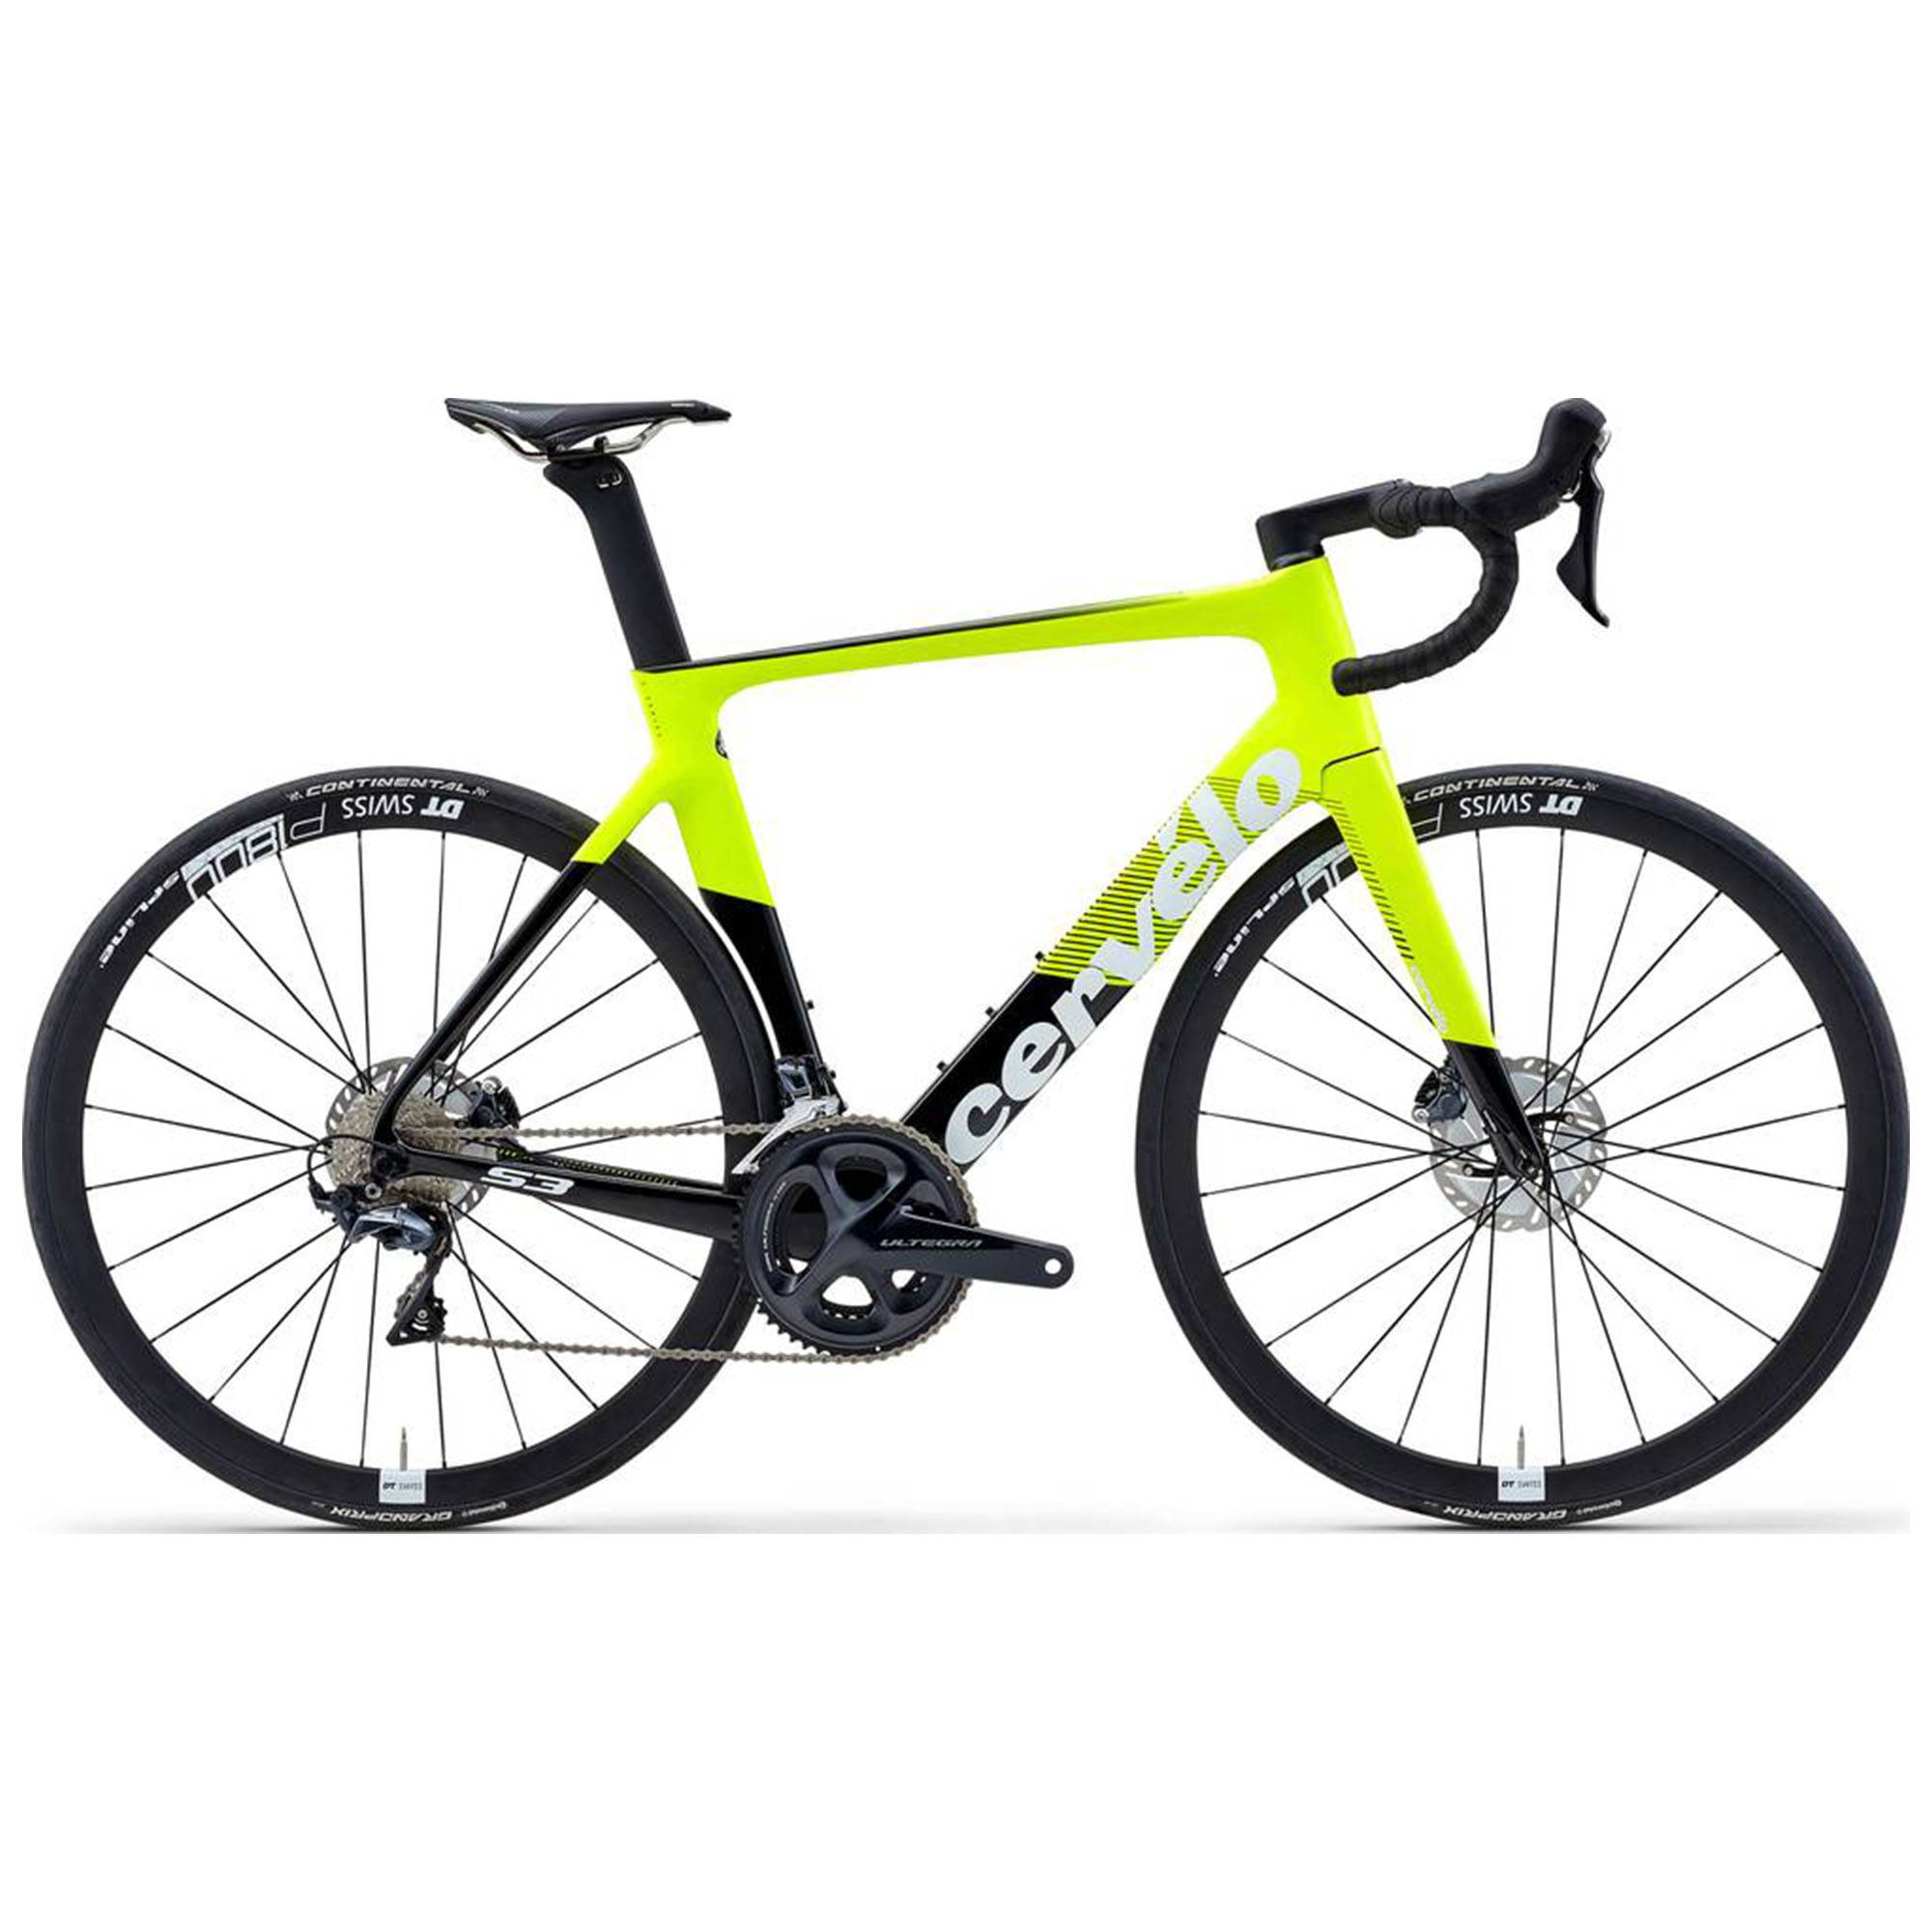 Cervelo Men's S3 Ultegra Disc Road Bike '20  - Yello/Black - Size: 51